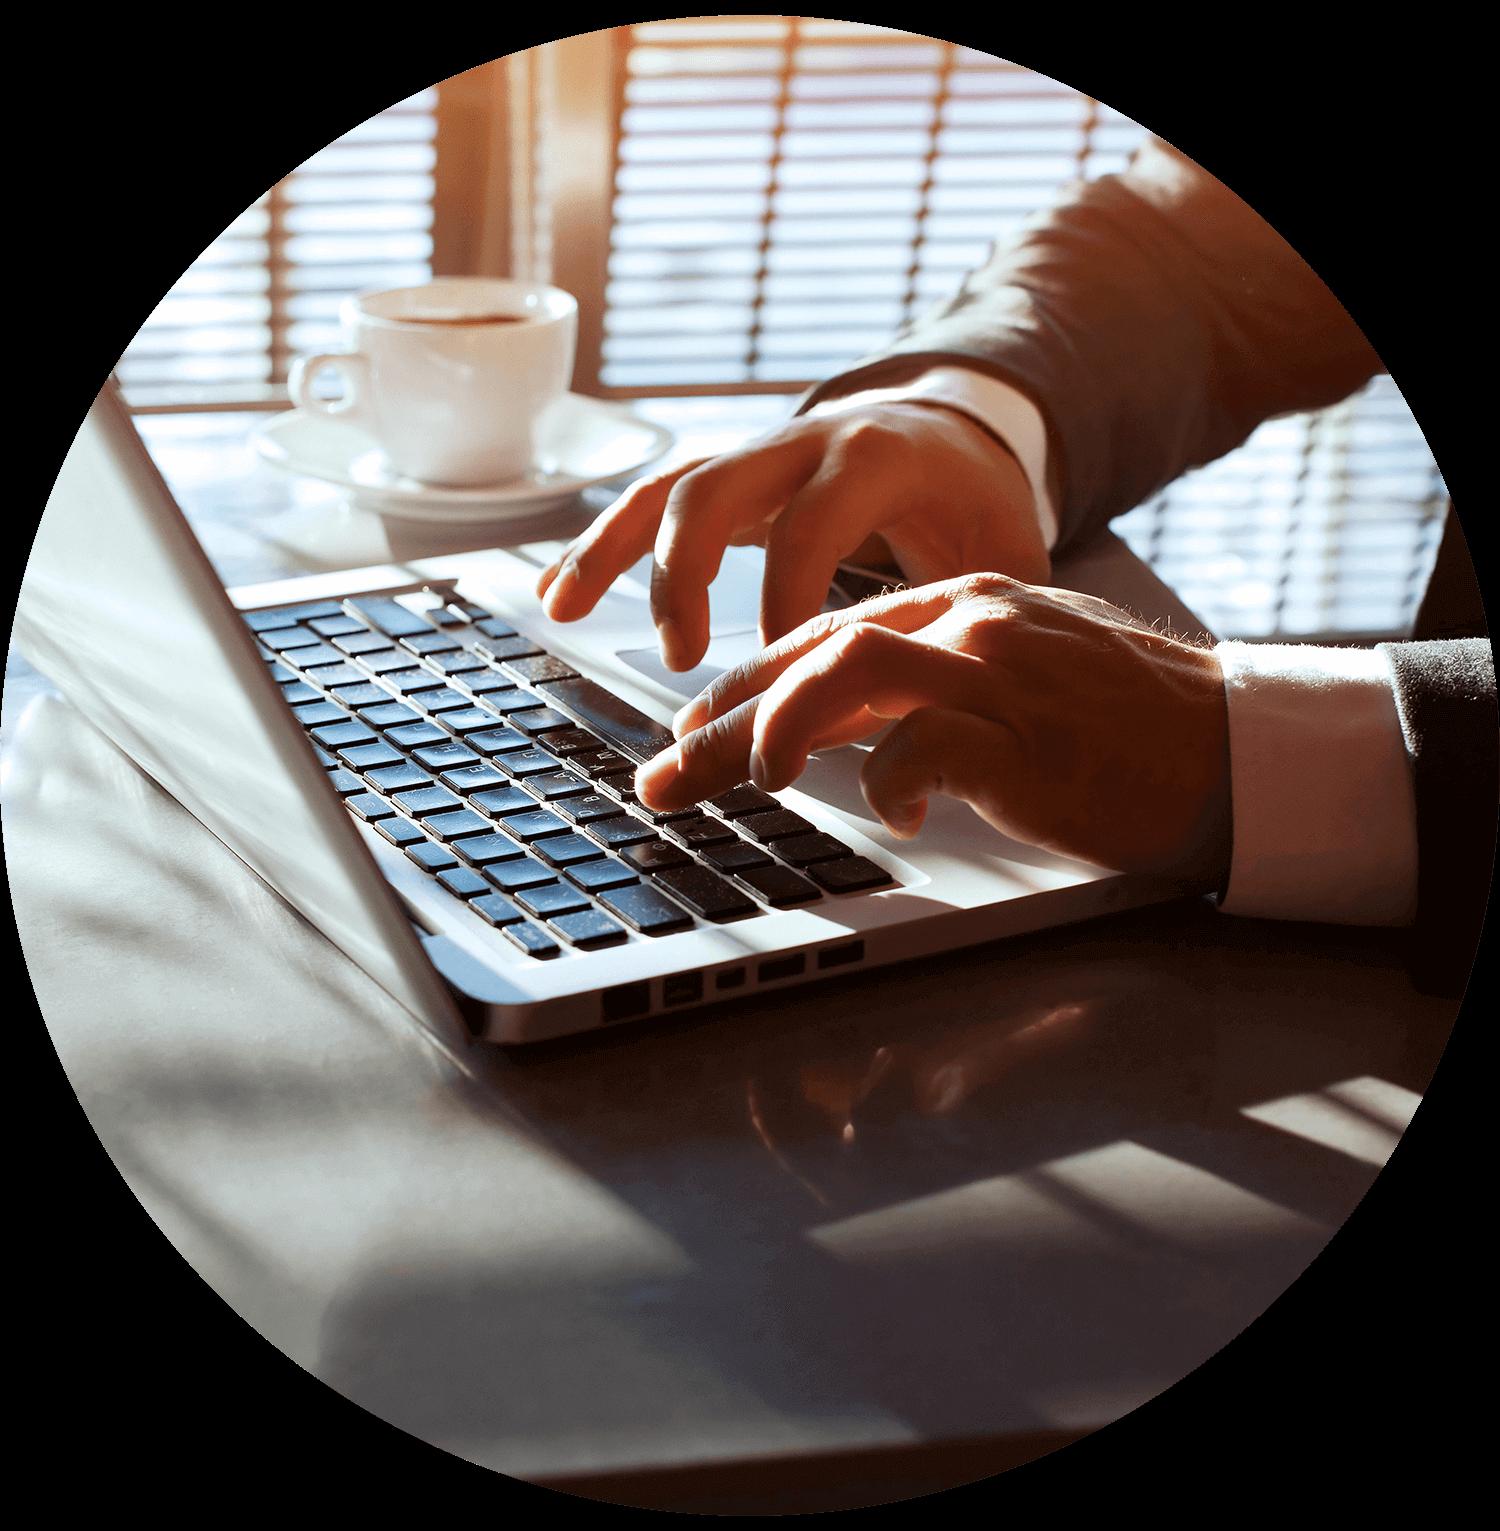 diy-online-learning-web